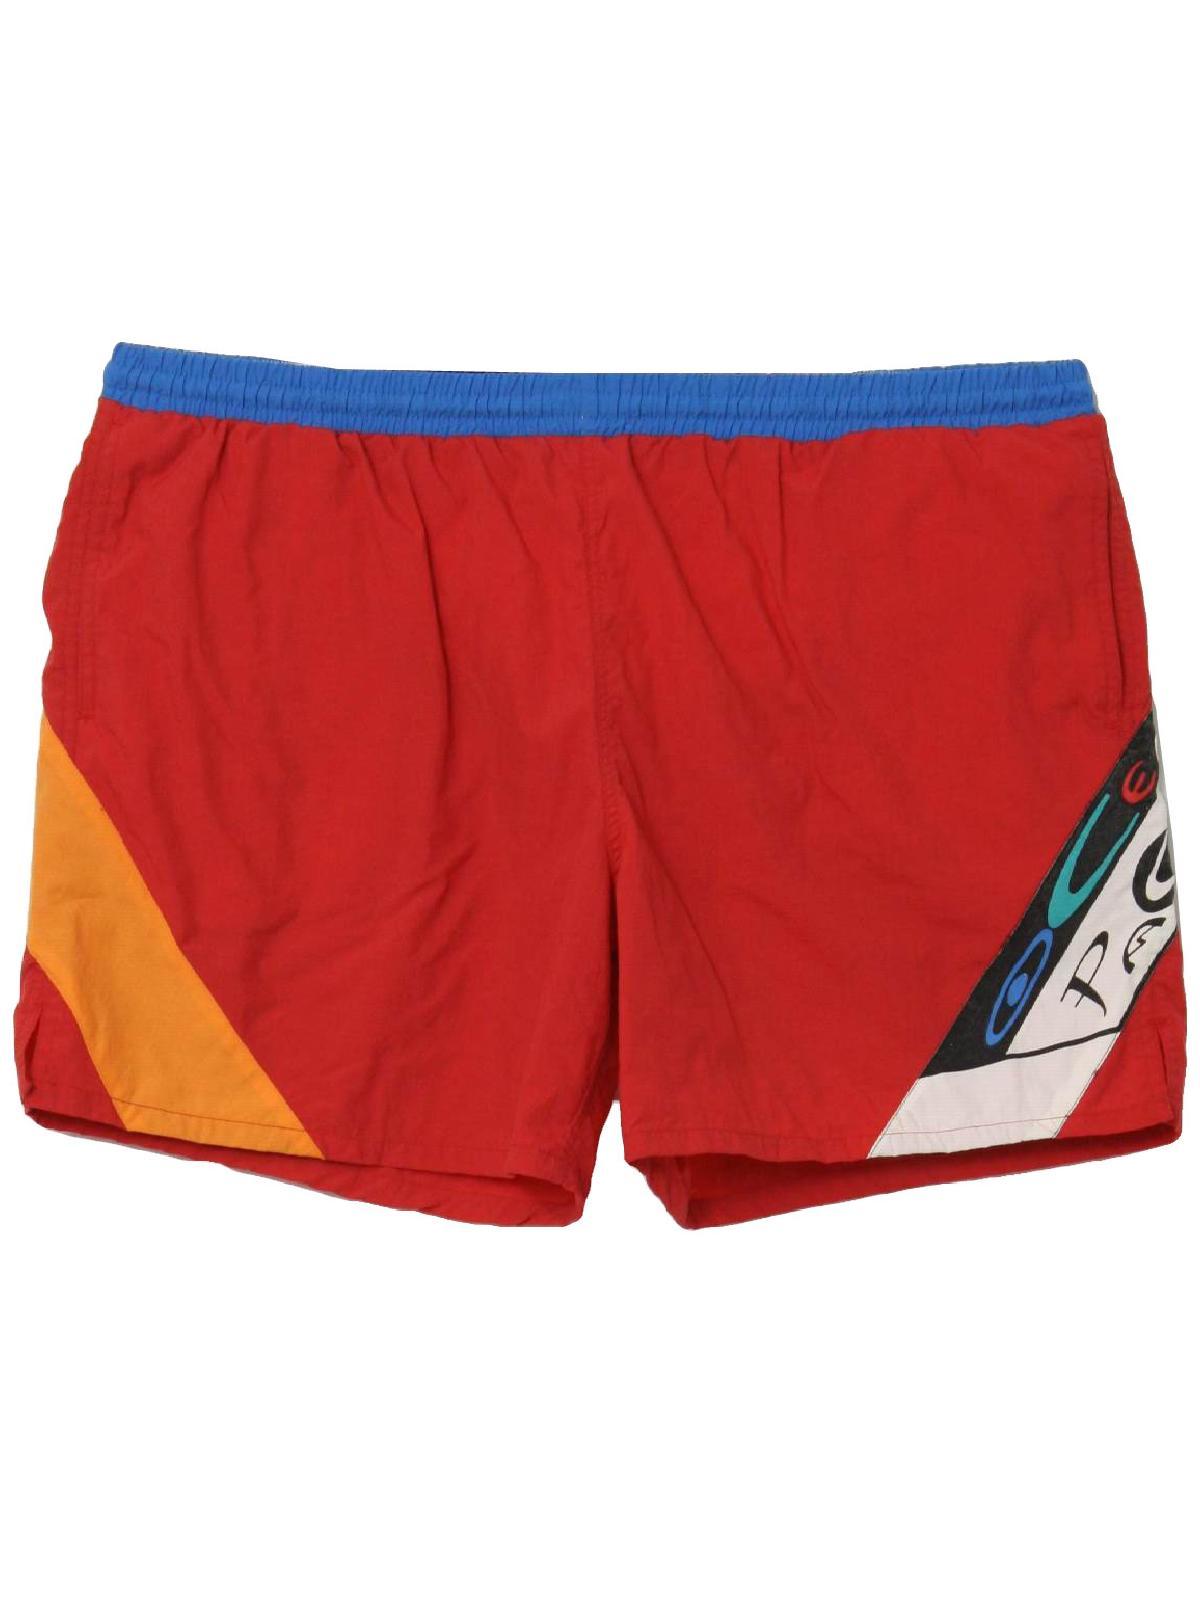 5ca0c35848 80's OP Ocean Pacific Made in USA Swimsuit/Swimwear: 80s -OP Ocean ...